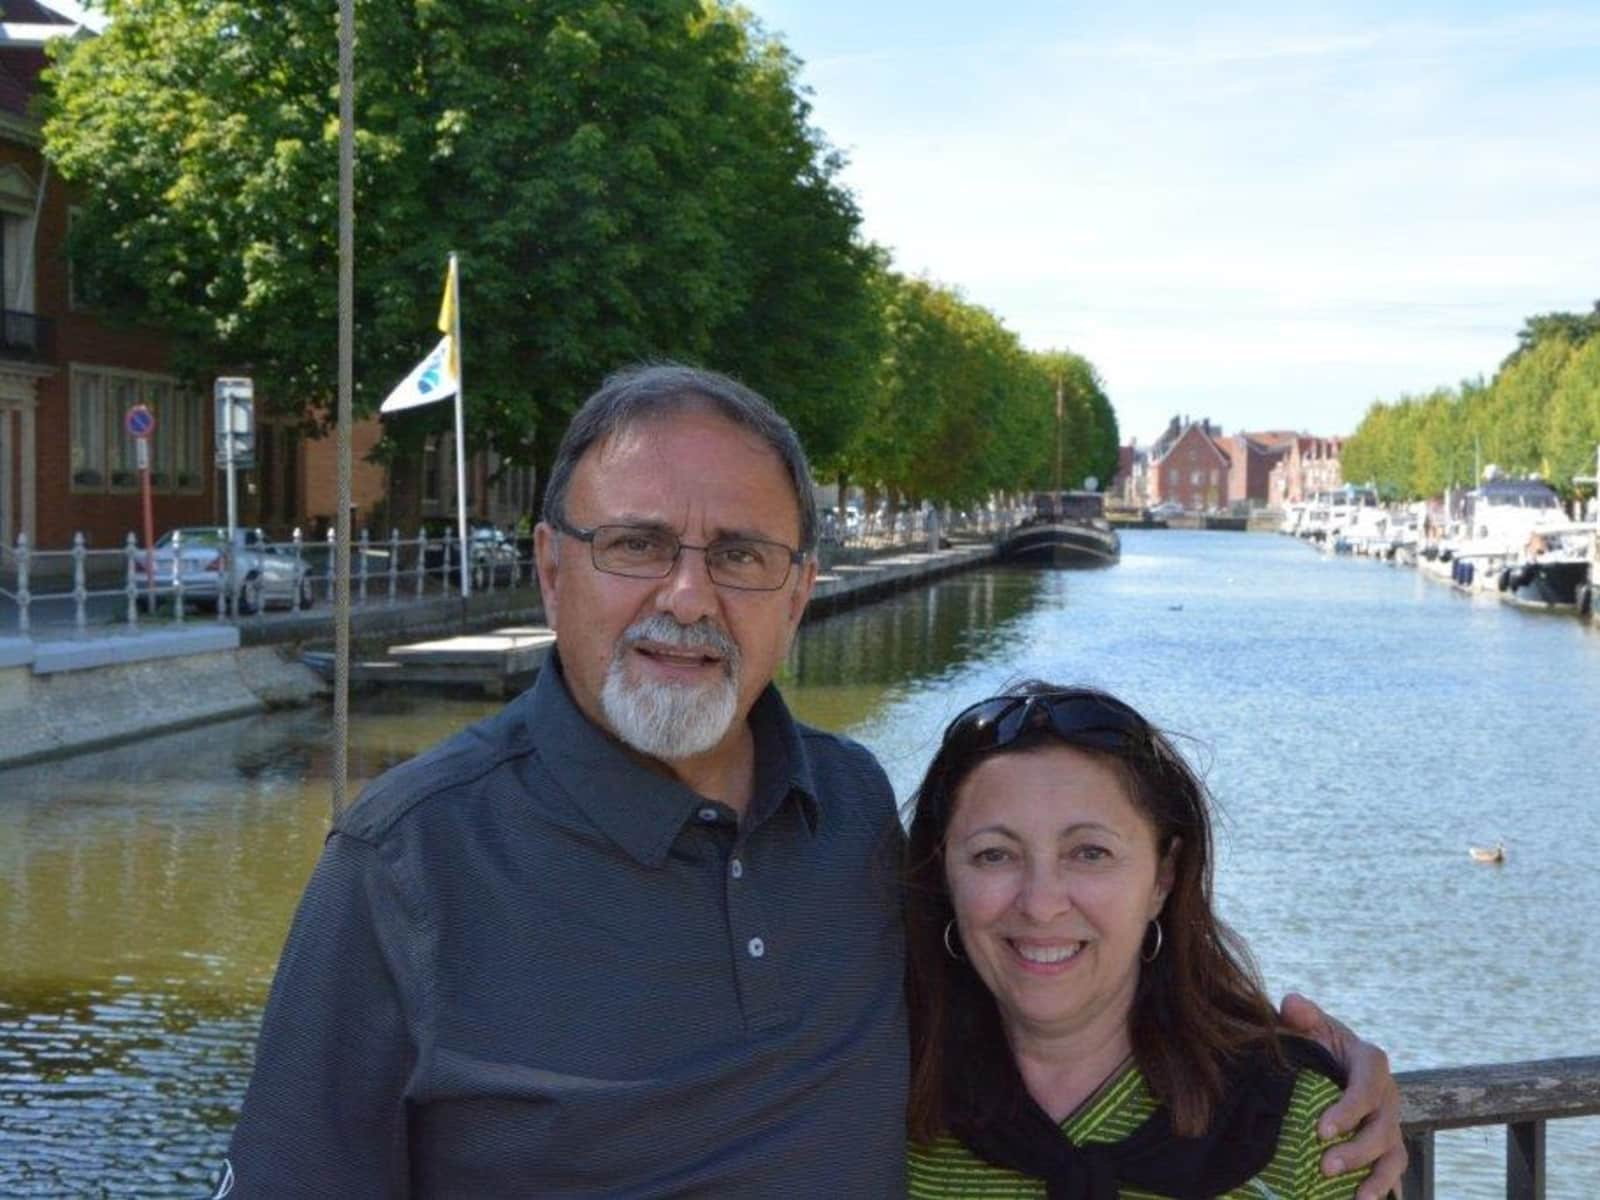 Debbie & Angelo from Trois-Rivières, Quebec, Canada